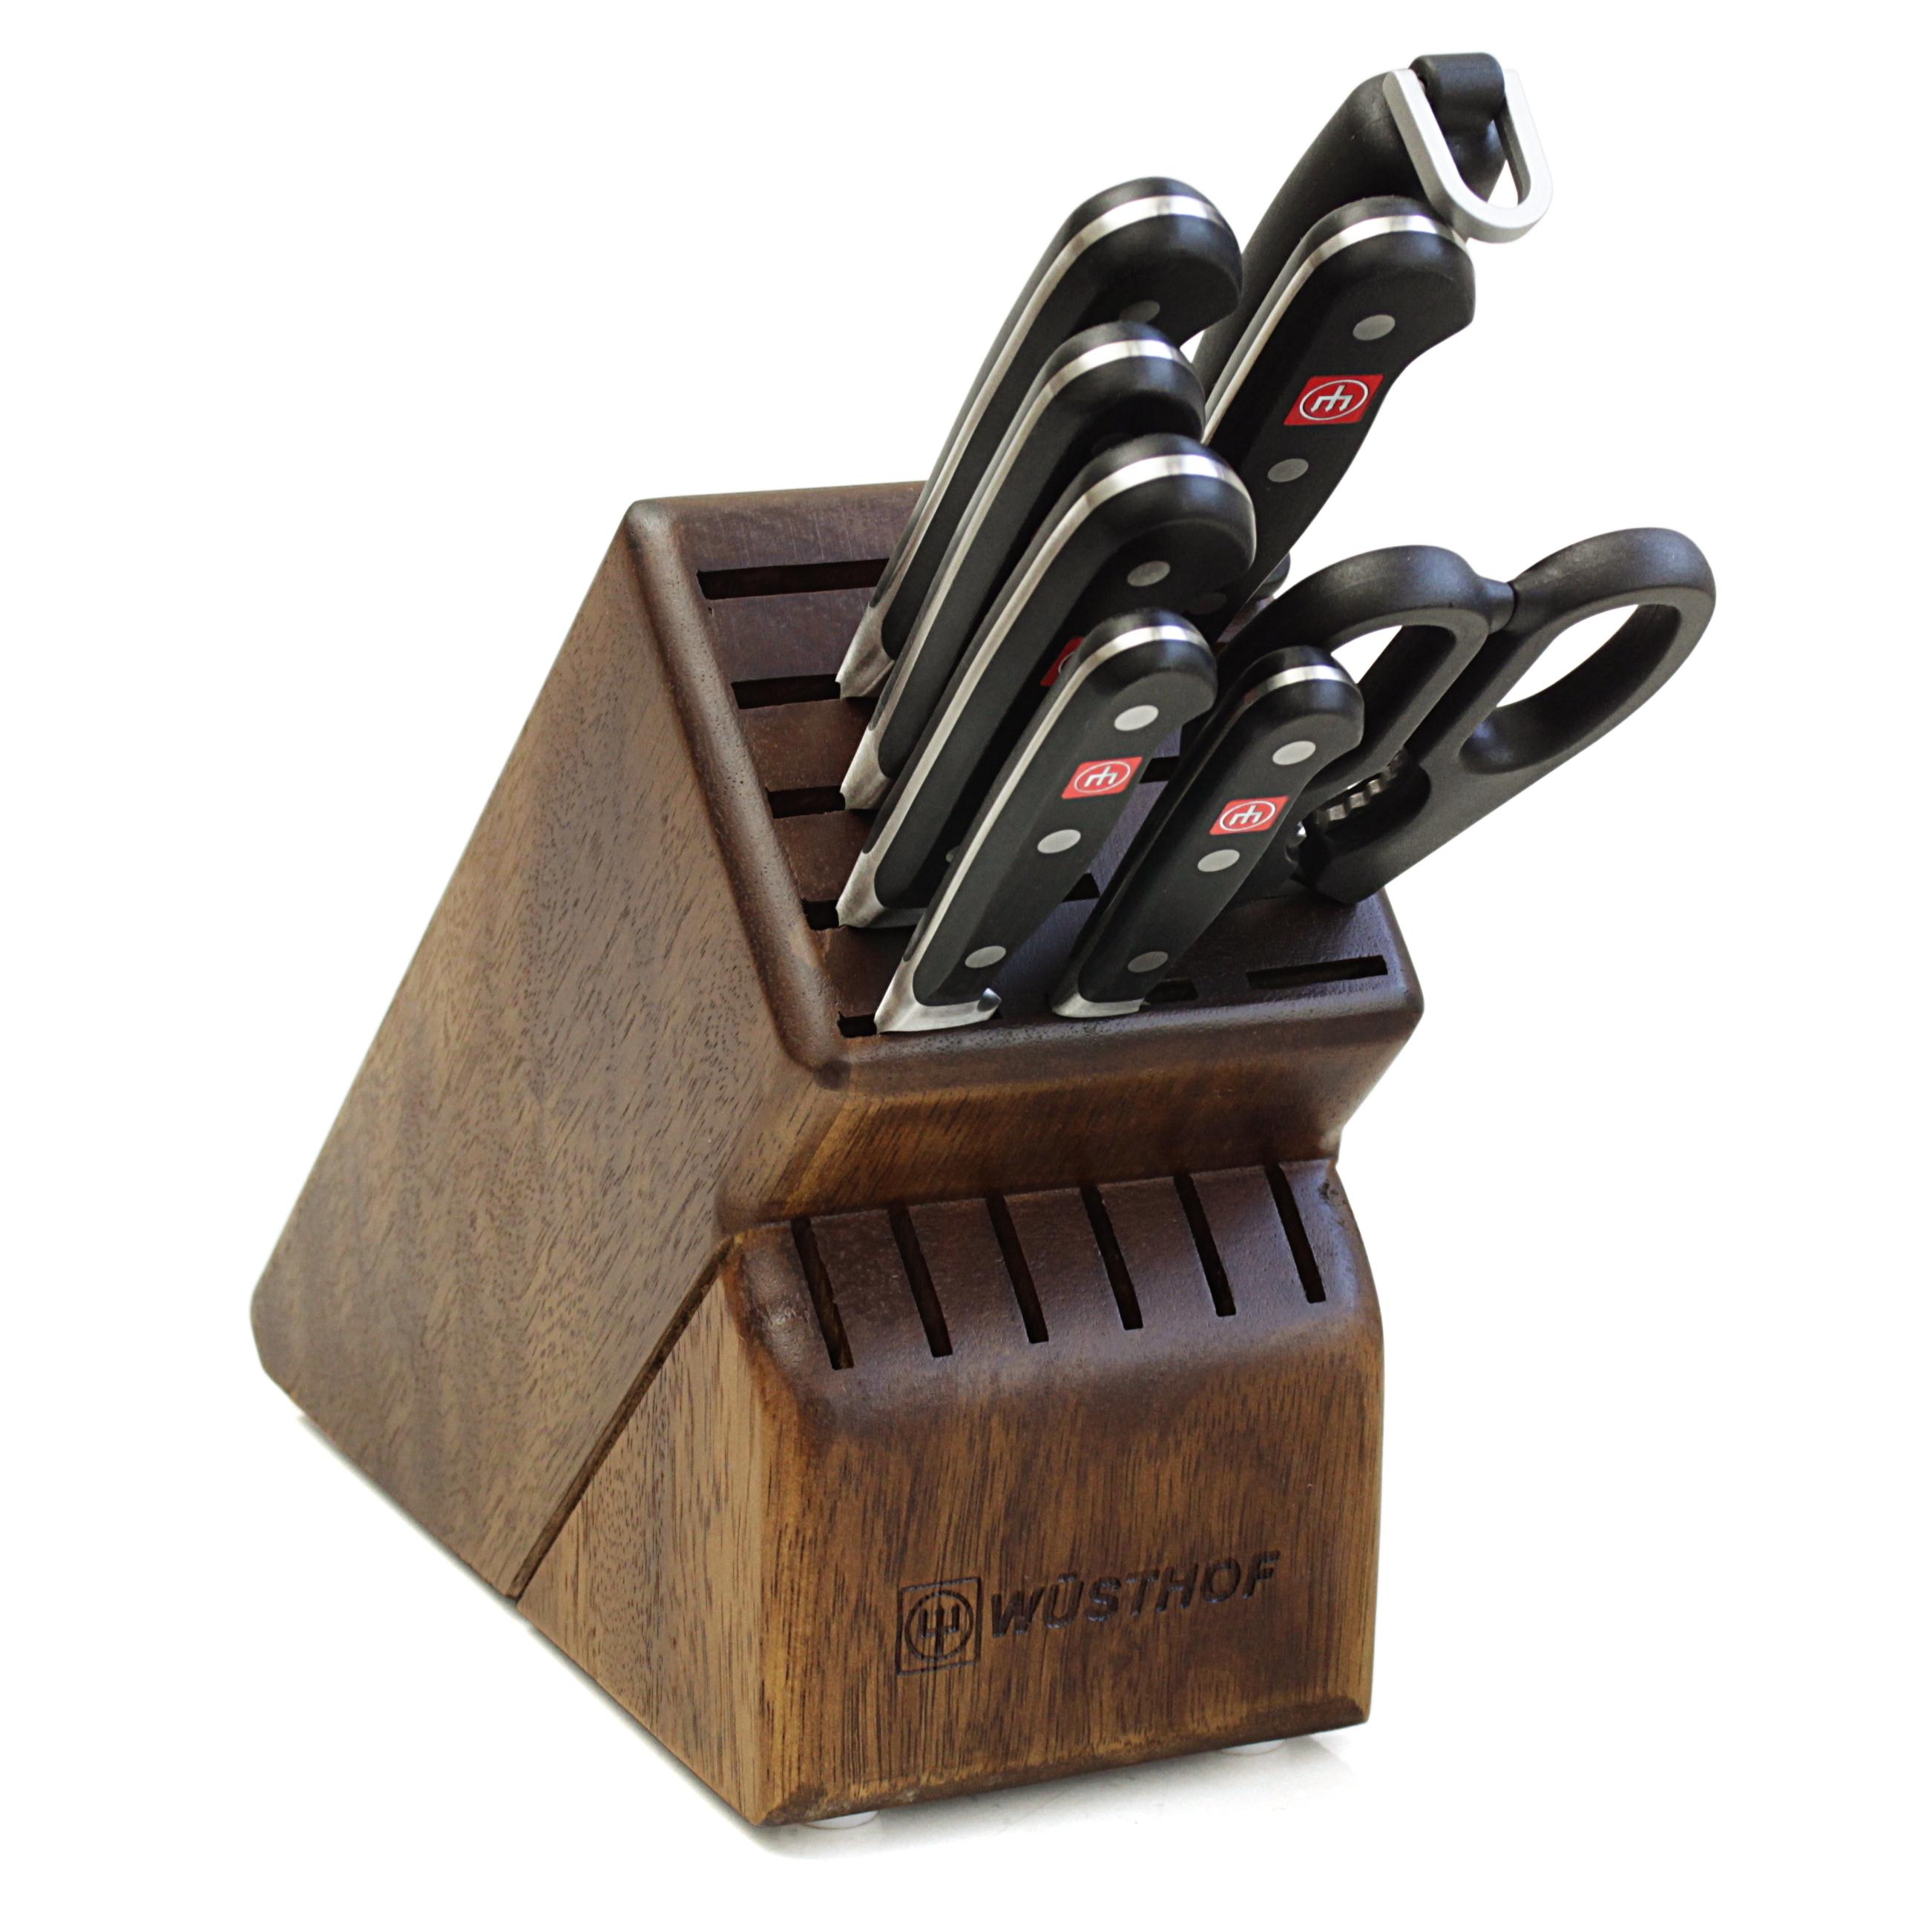 Wusthof Classic 10 Piece Knife and Walnut Block Bundle - BigKitchen Exclusive